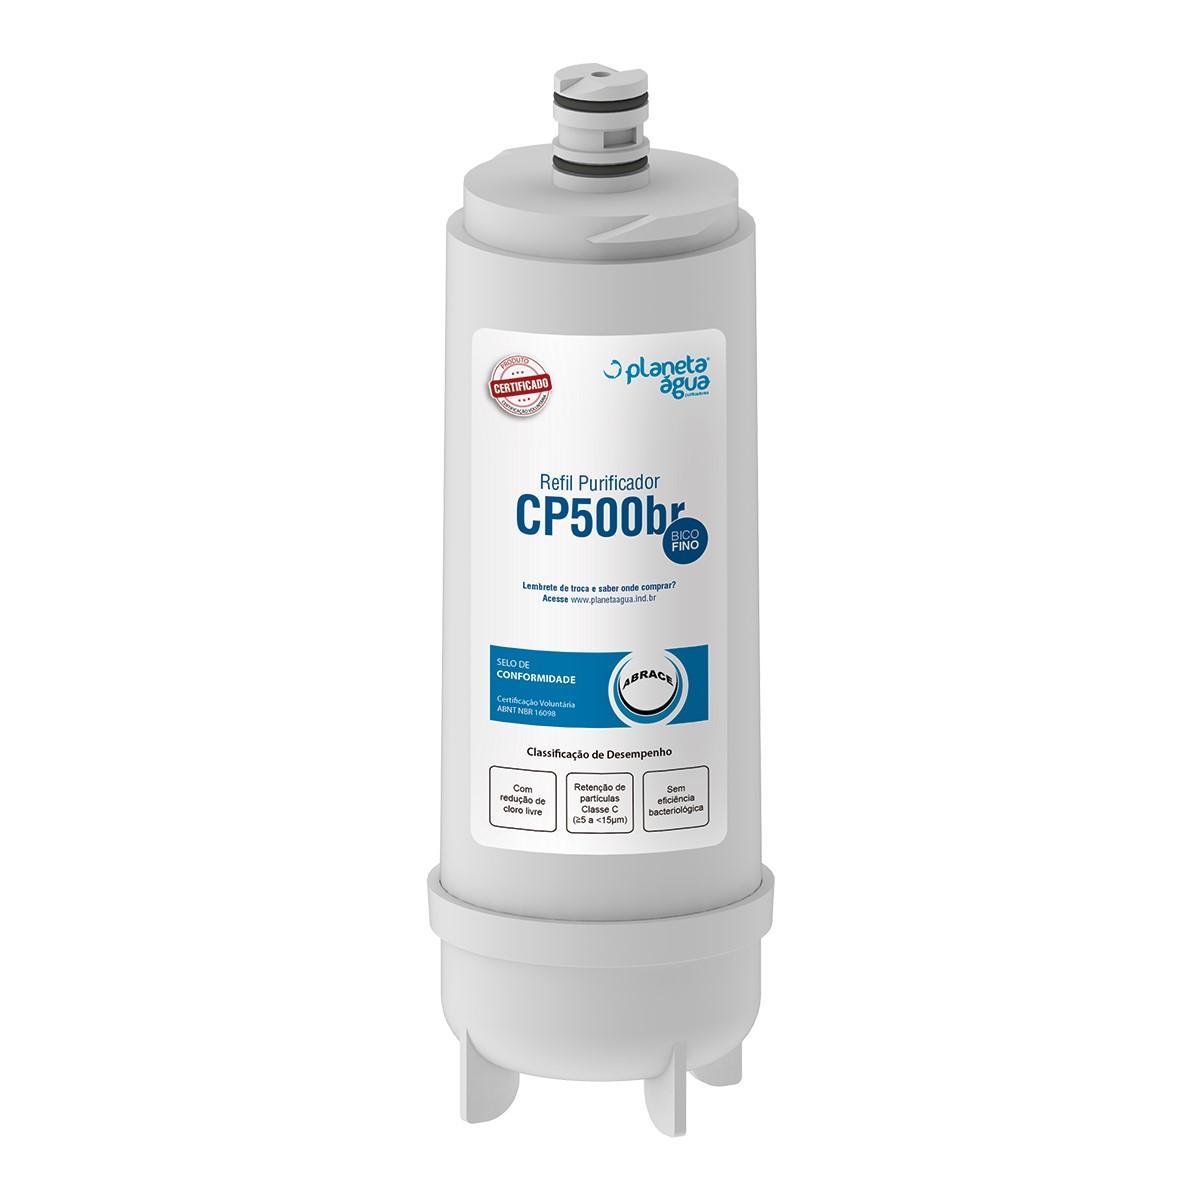 Refil Filtro Planeta Água CP500BR para Purificador de Água Master Frio Rótulo Branco e New Up